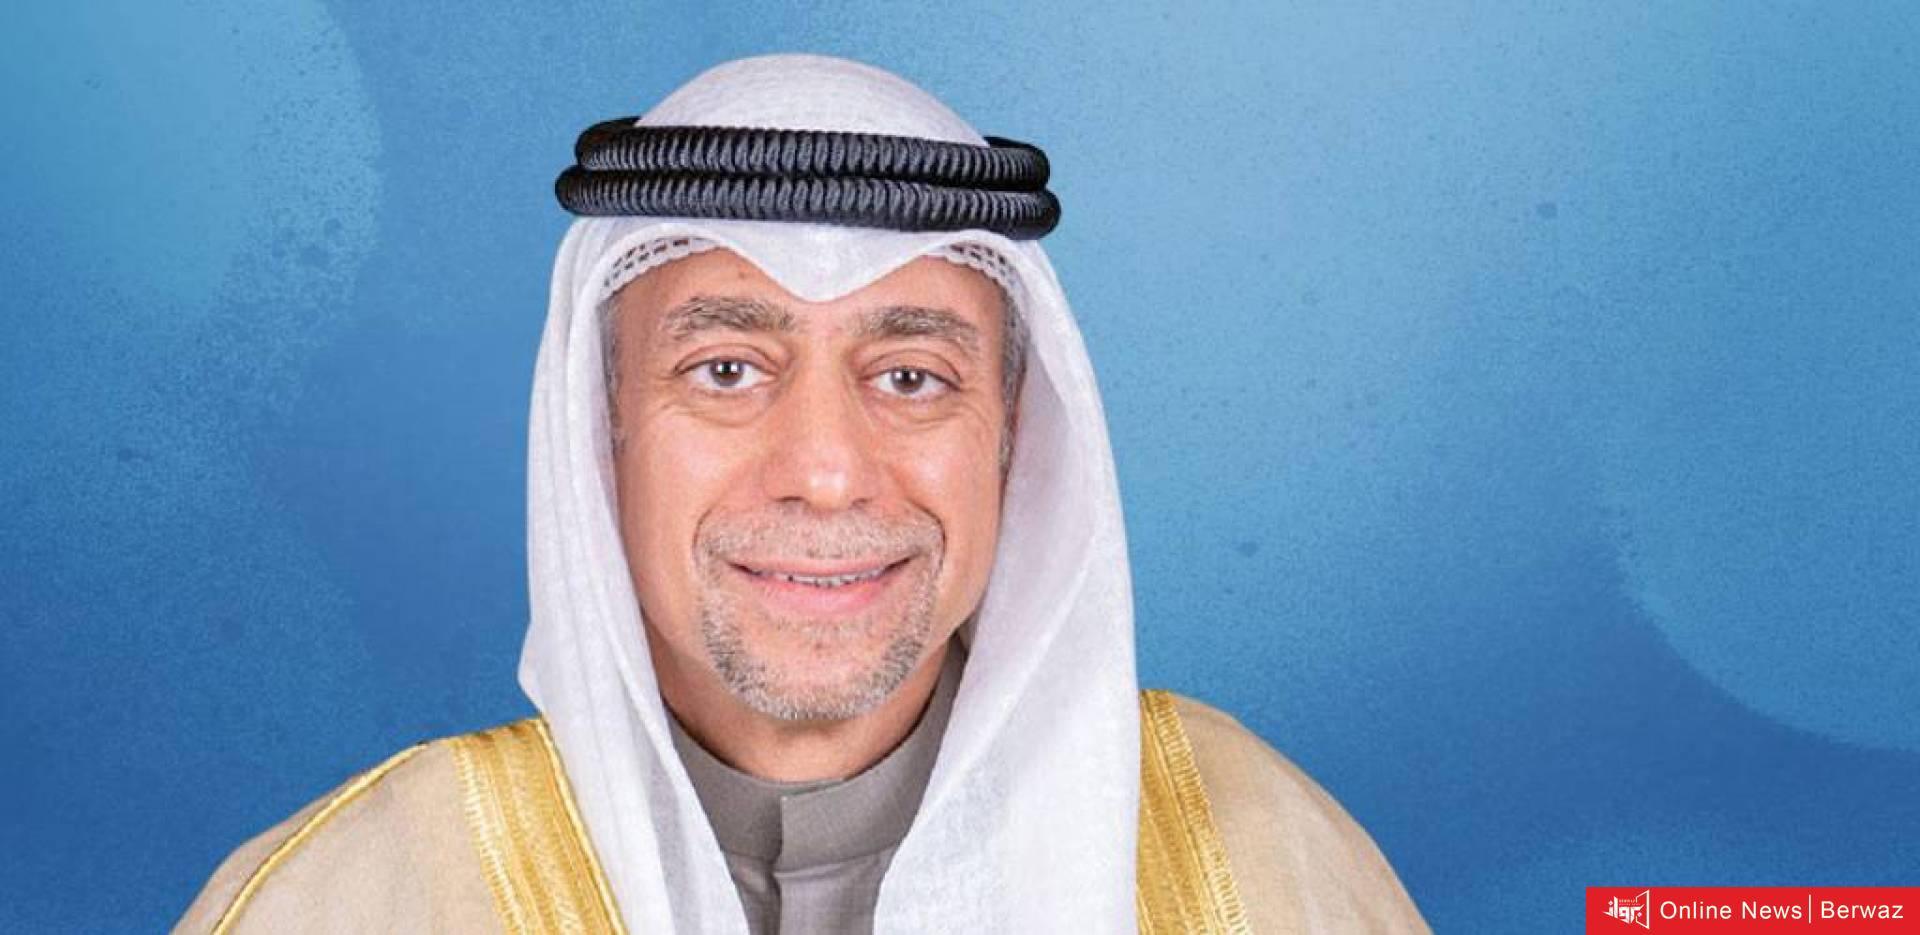 23 731979 highres - عبدالله معرفي يعد أهالي مدينة صباح الأحمد بمراكز ترفيهية وخدمية قريبا